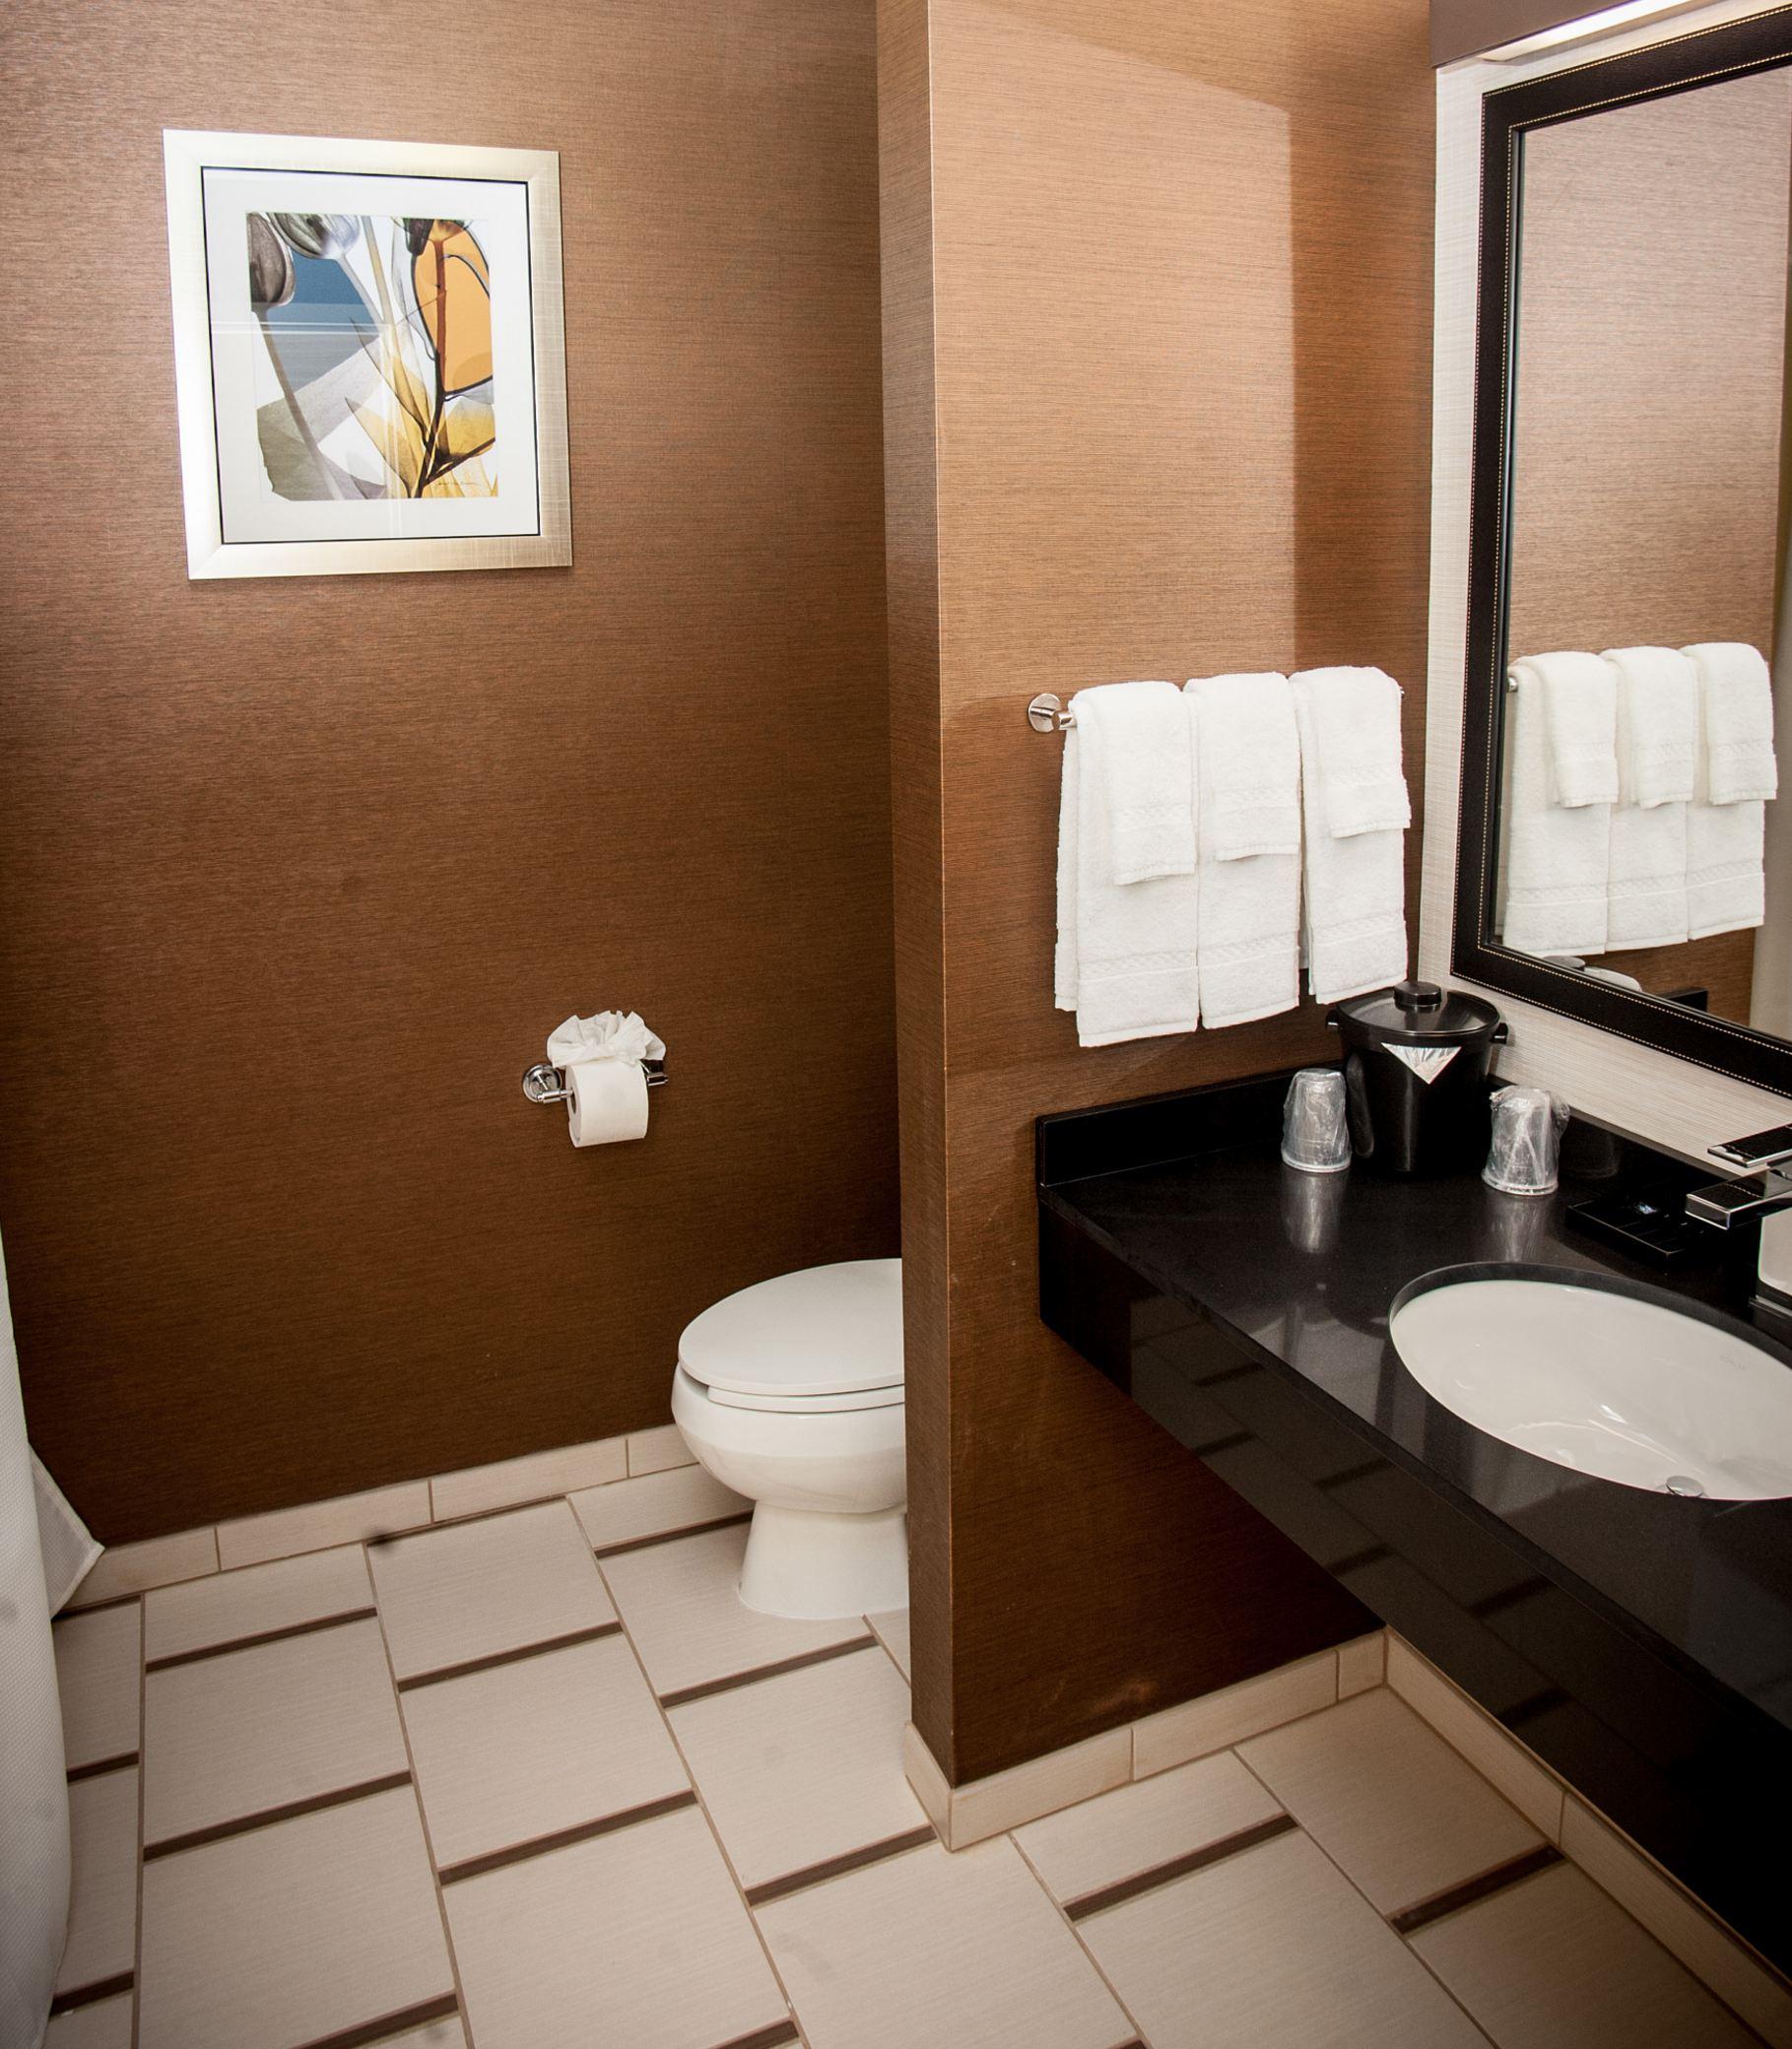 Fairfield Inn & Suites by Marriott Akron South image 2